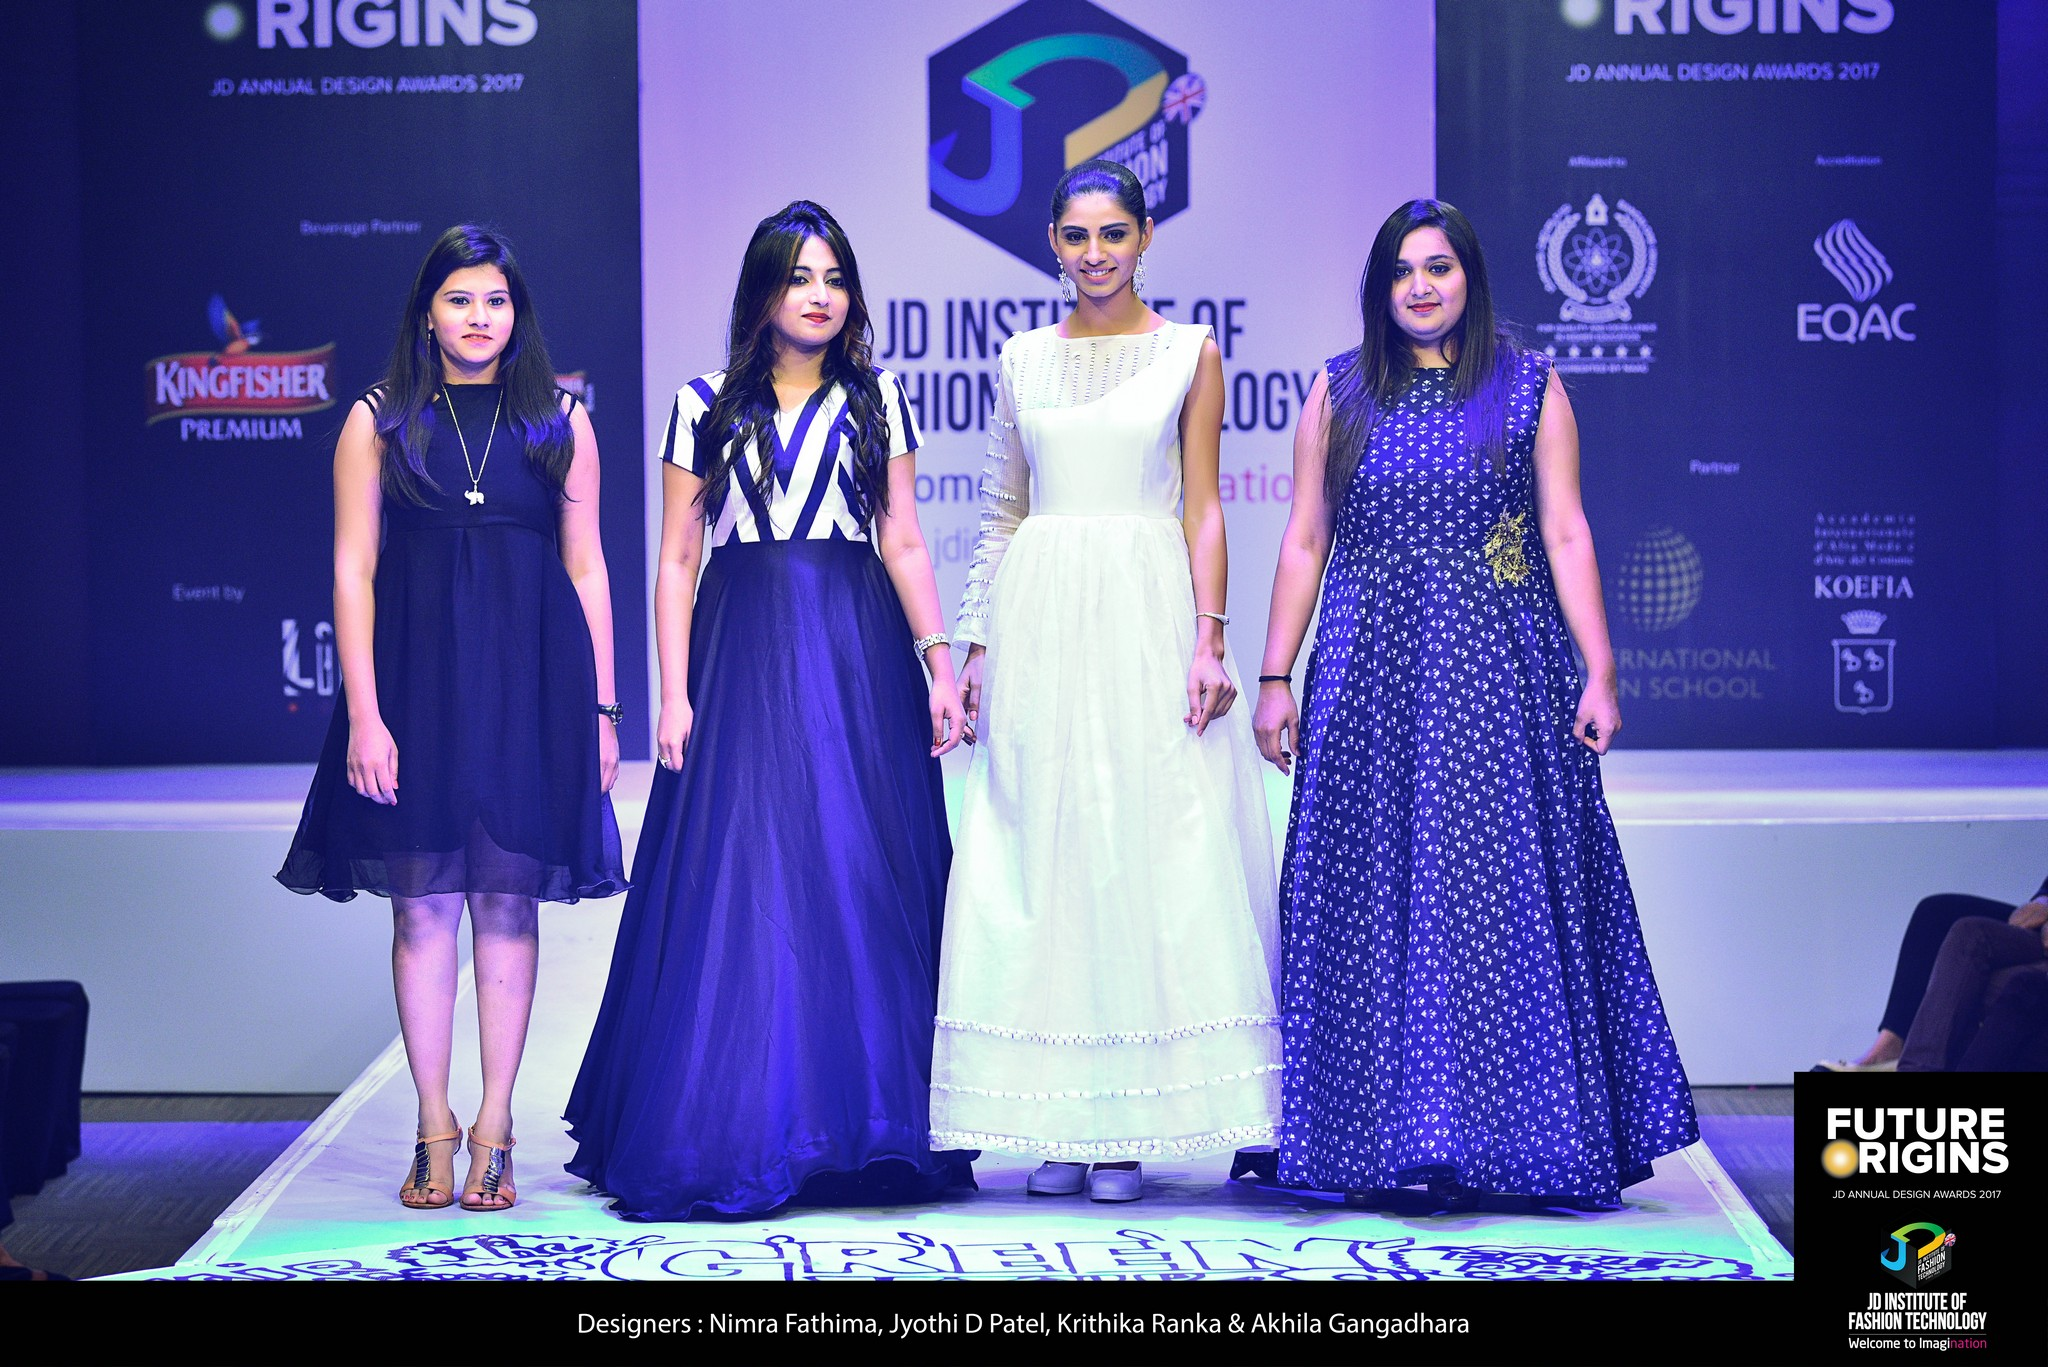 Diaphanous Whites - Future Origin - JD Annual Design Awards 2017 | Photography : Jerin Nath (@jerin_nath) diaphanous whites - Diaphanous Whites Future Origin JD Annual Design Awards 2017 7 - Diaphanous Whites – Future Origin – JD Annual Design Awards 2017